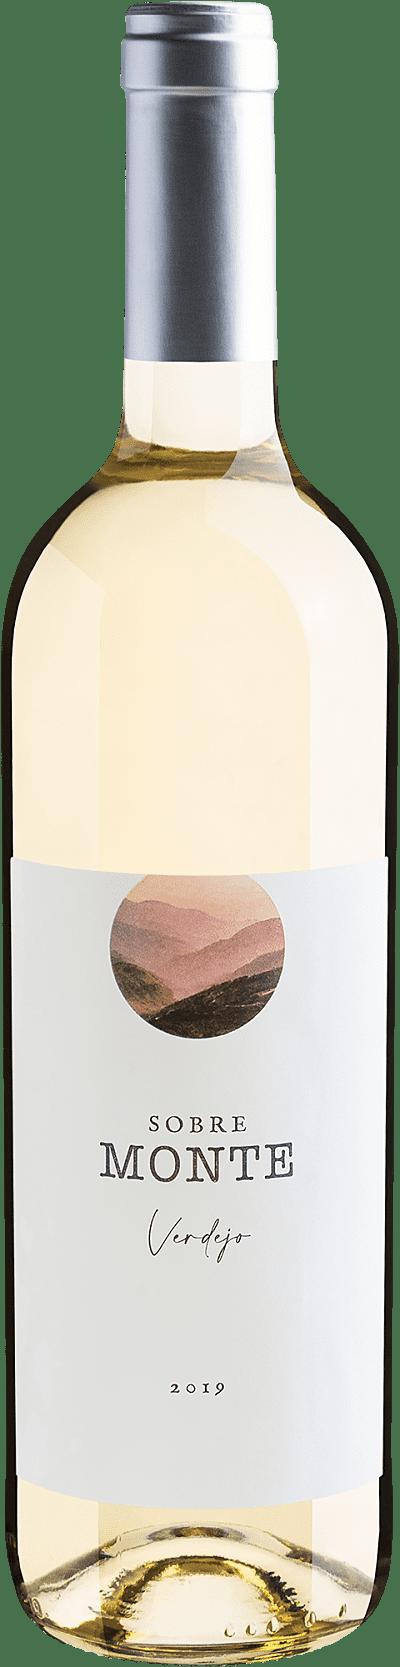 Vinho Branco - Sobre Monte Verdejo 2019 Verdejo - Espanha